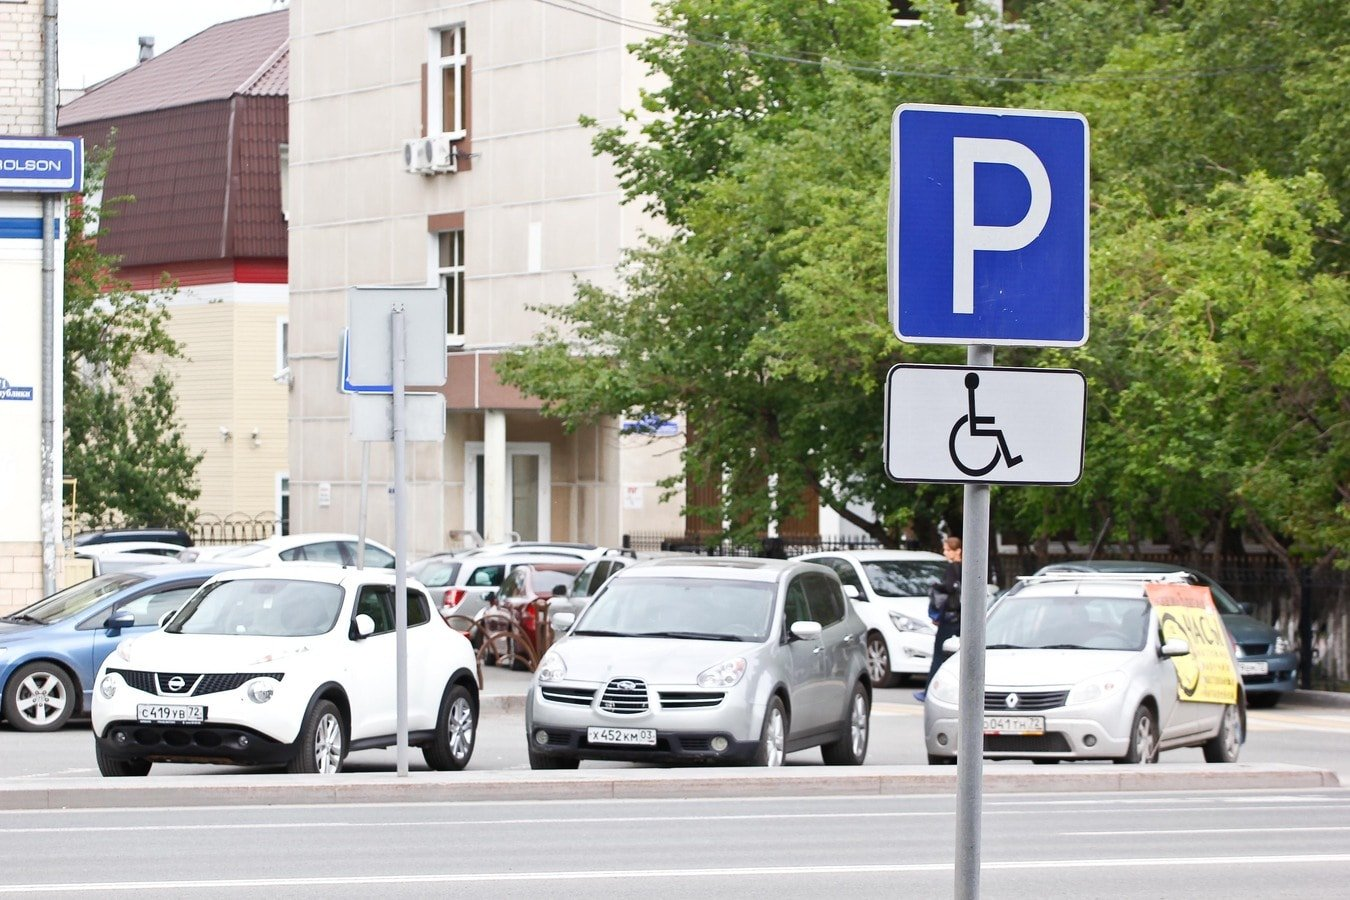 Обозначение парковки и зона действия знака